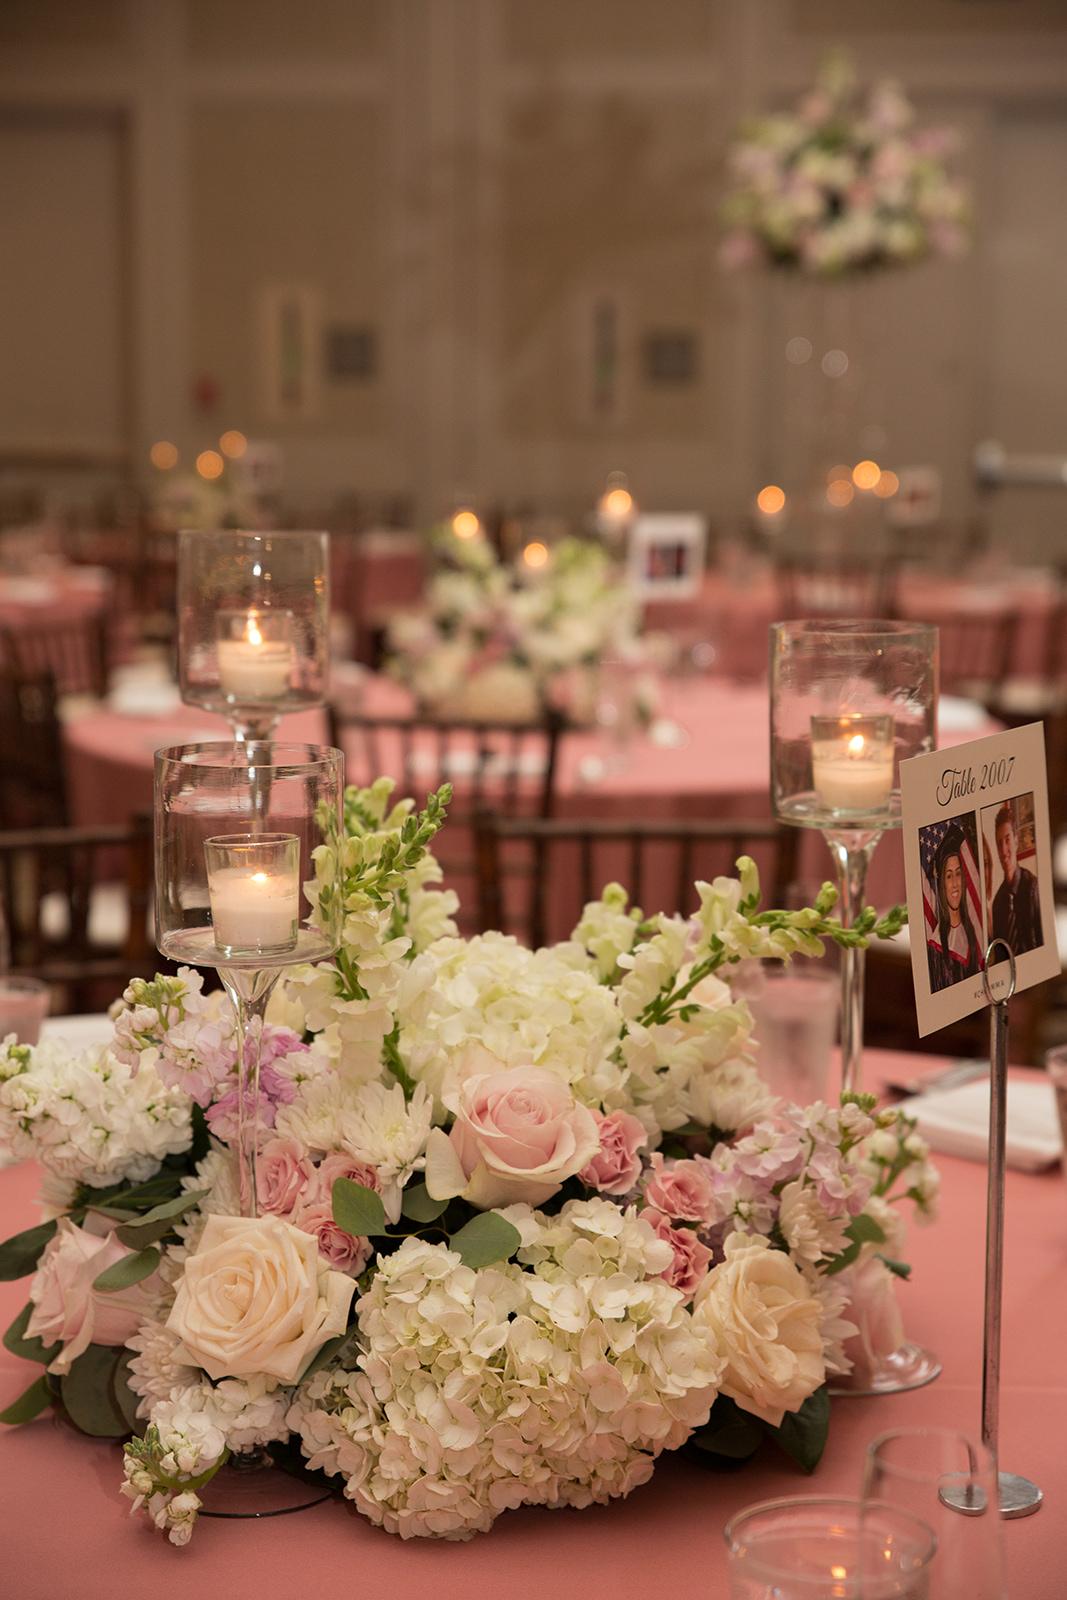 Le Cape Weddings - Sumeet and Chavi - Reception Details  -45.jpg